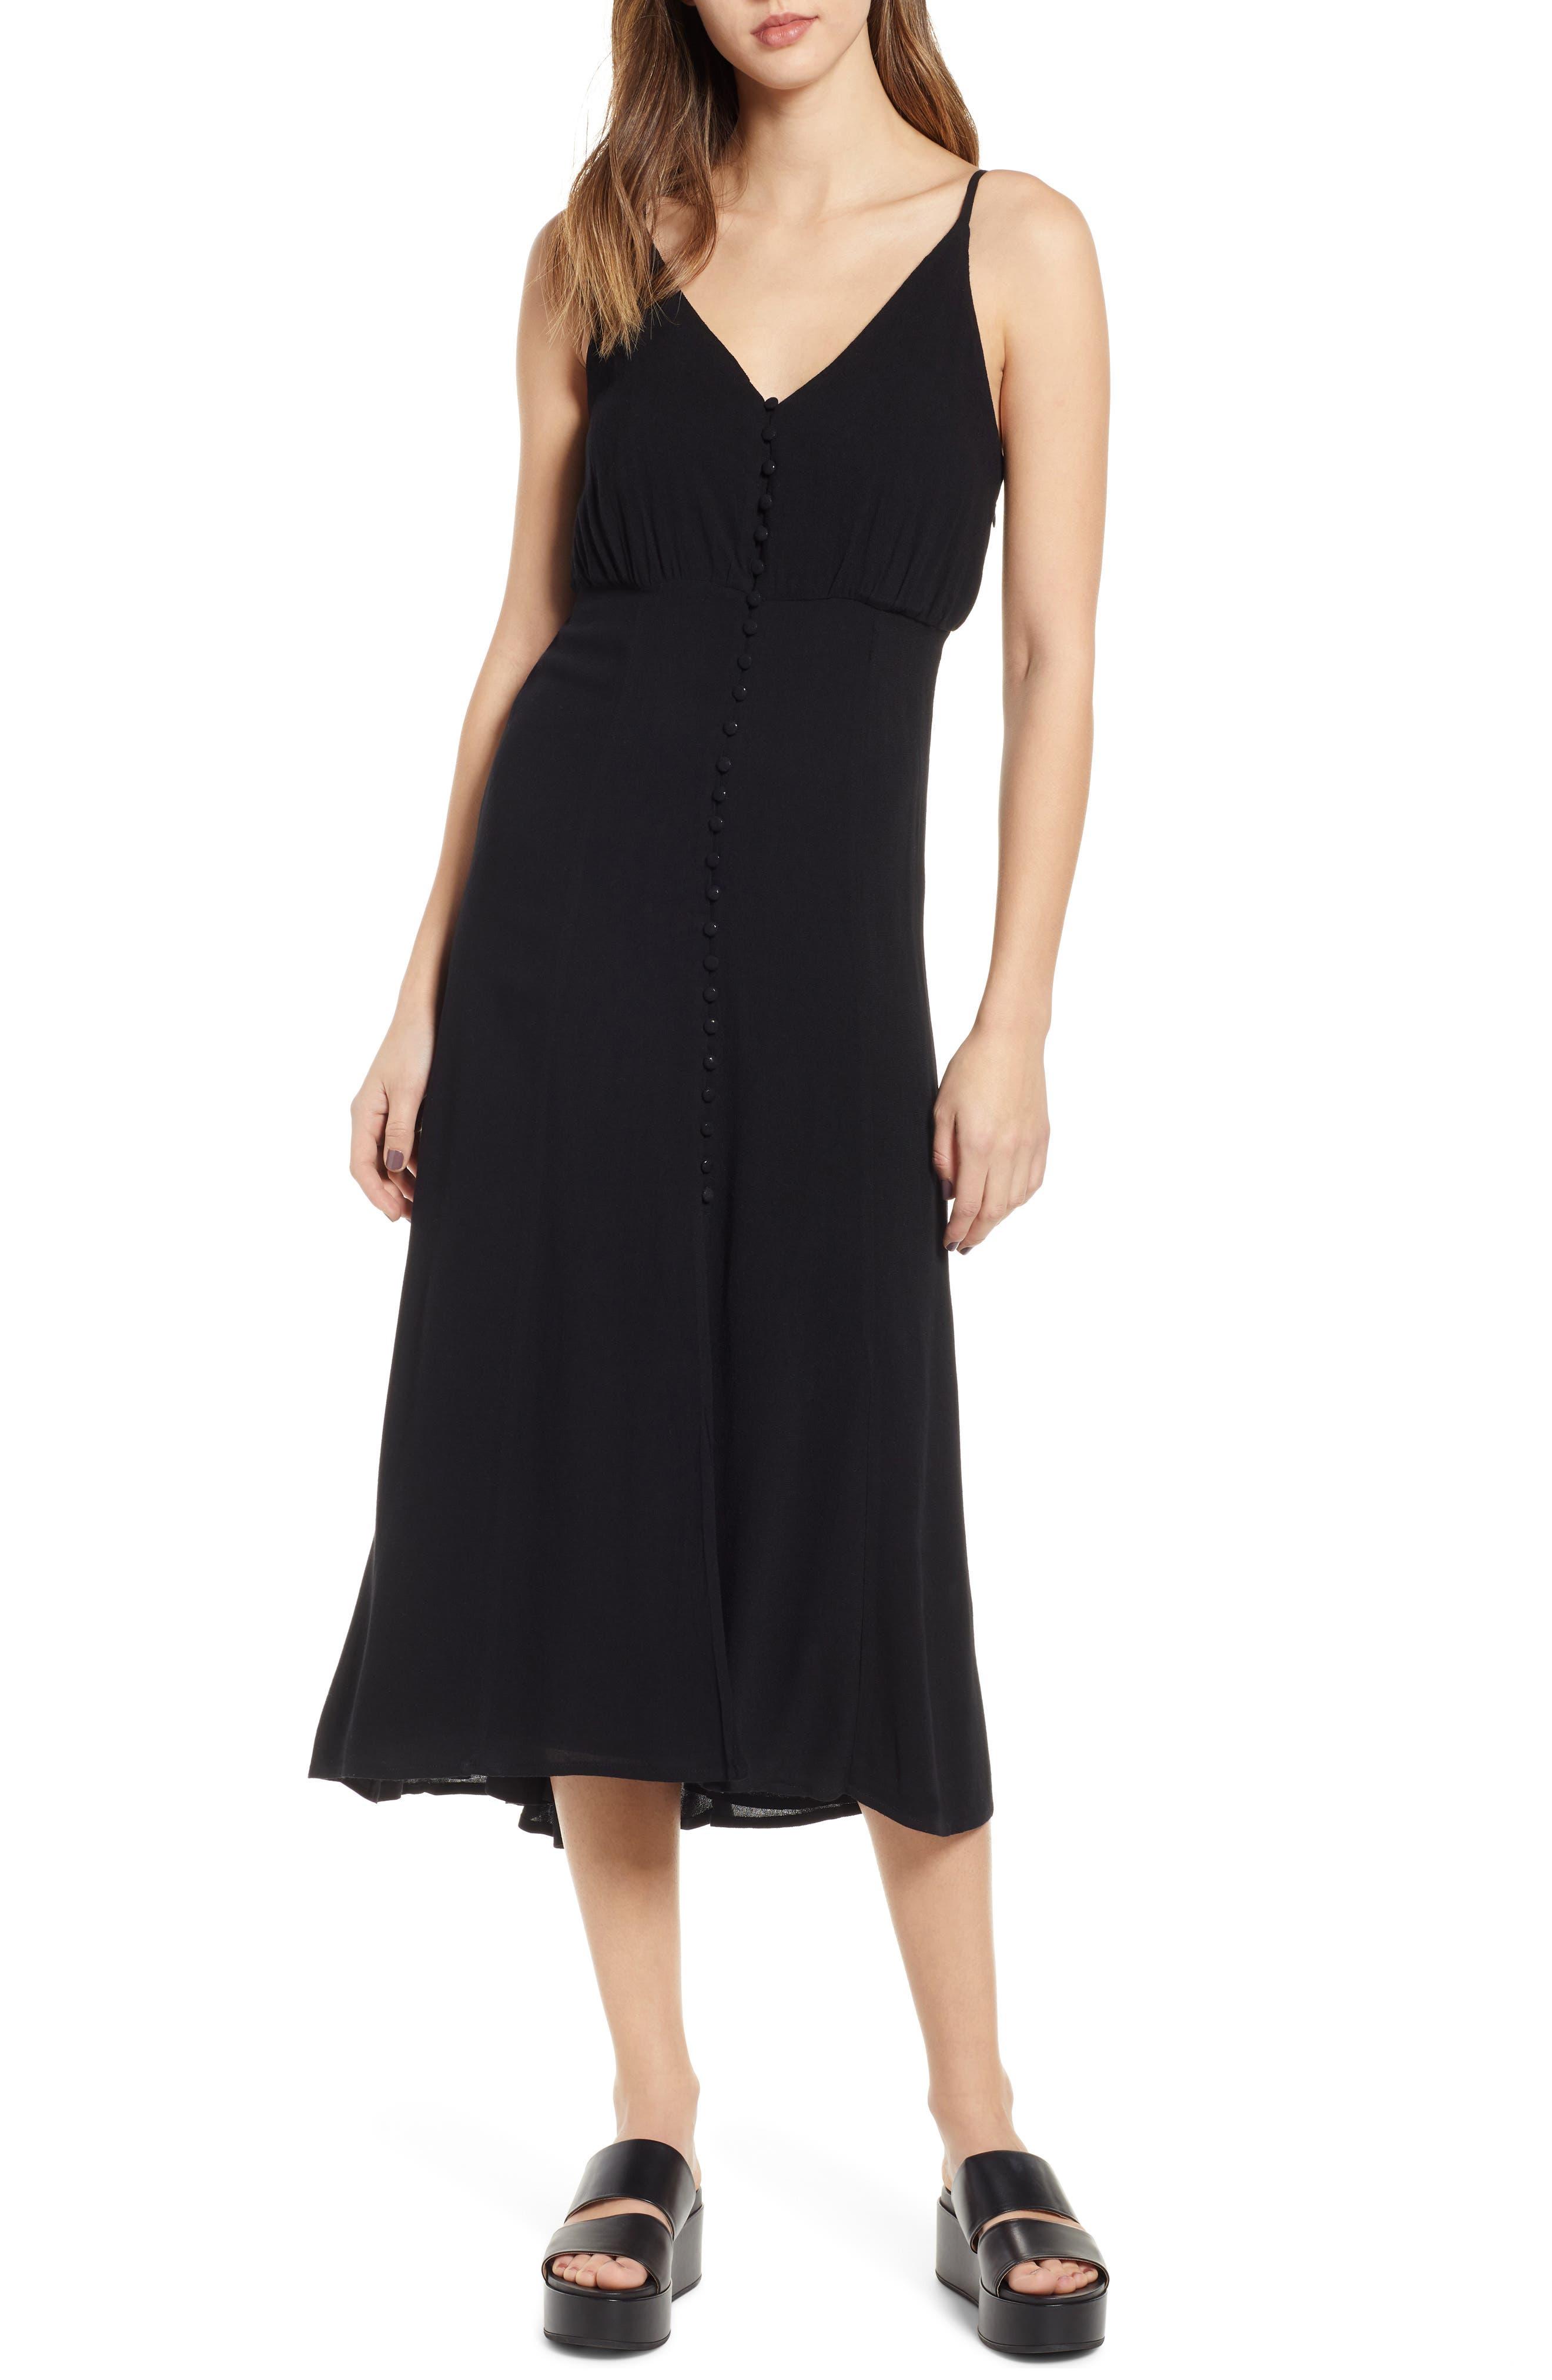 LIRA CLOTHING Cedar Break Midi Dress, Main, color, BLACK